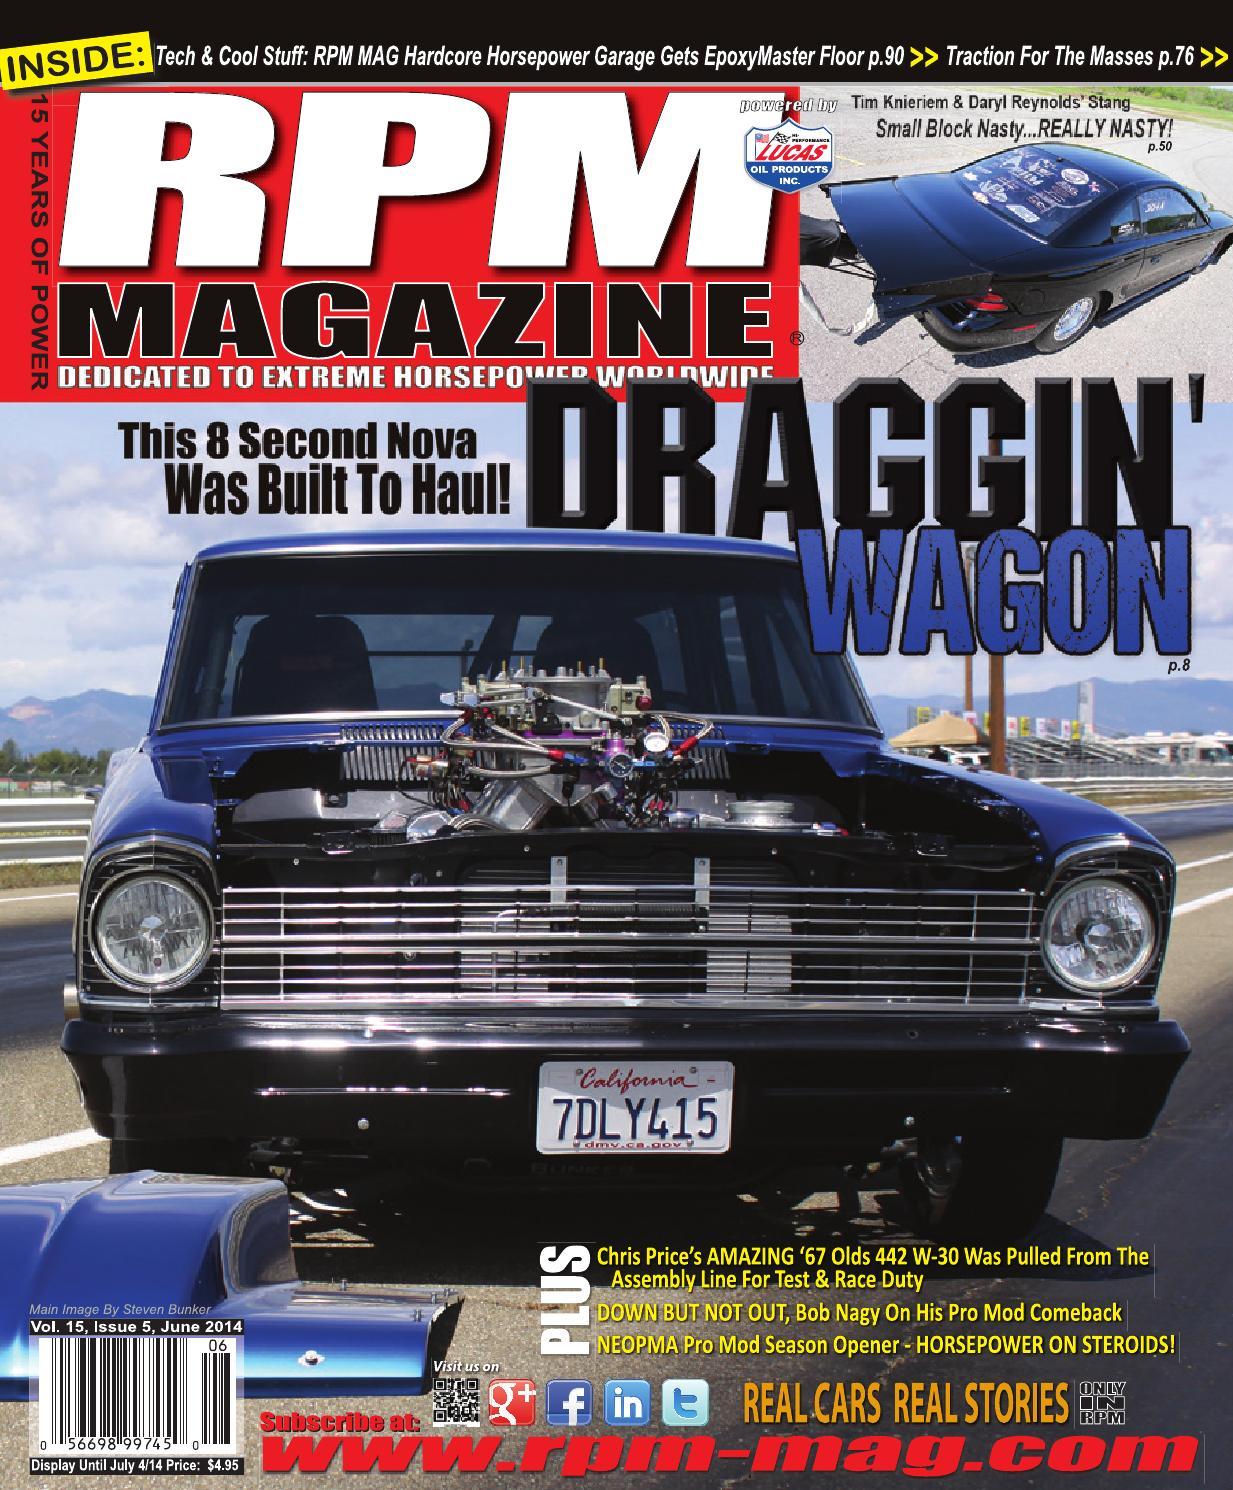 RPM Magazine June Issue 2014 by RPM Magazine - issuu